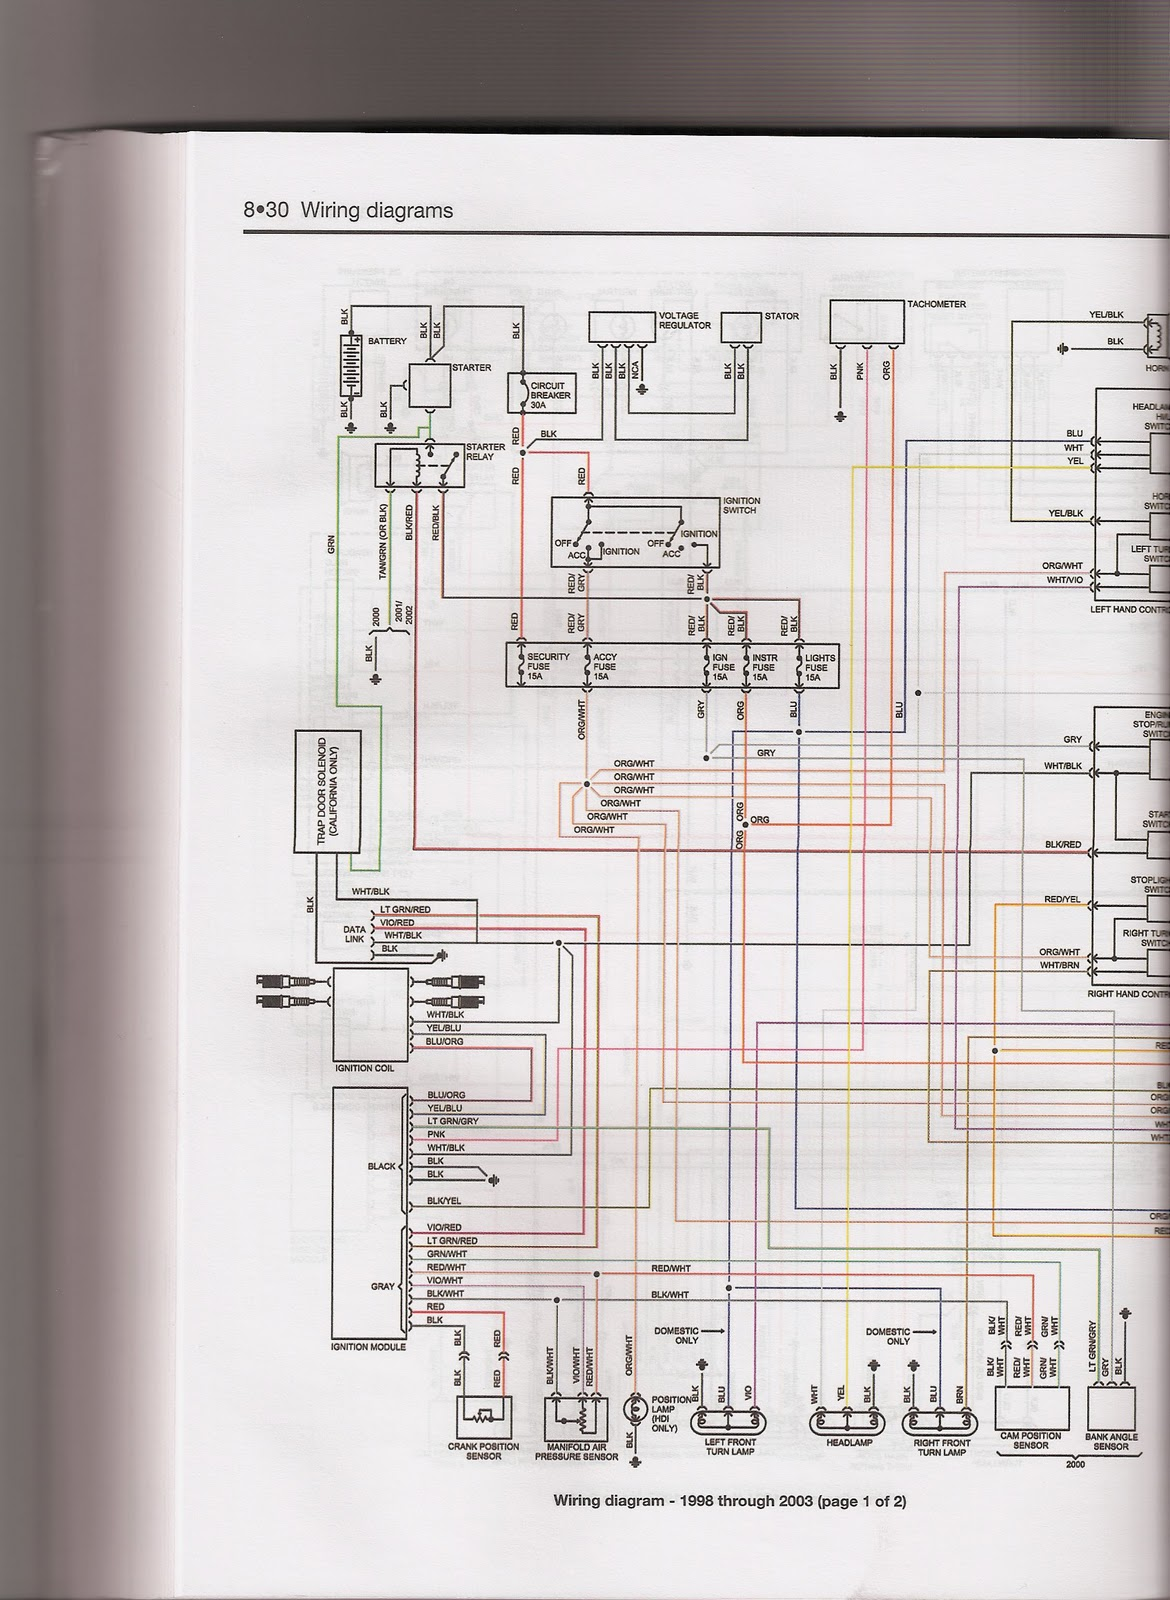 Kracker Jacks: Wiring diagrams for a 9803 Sportster